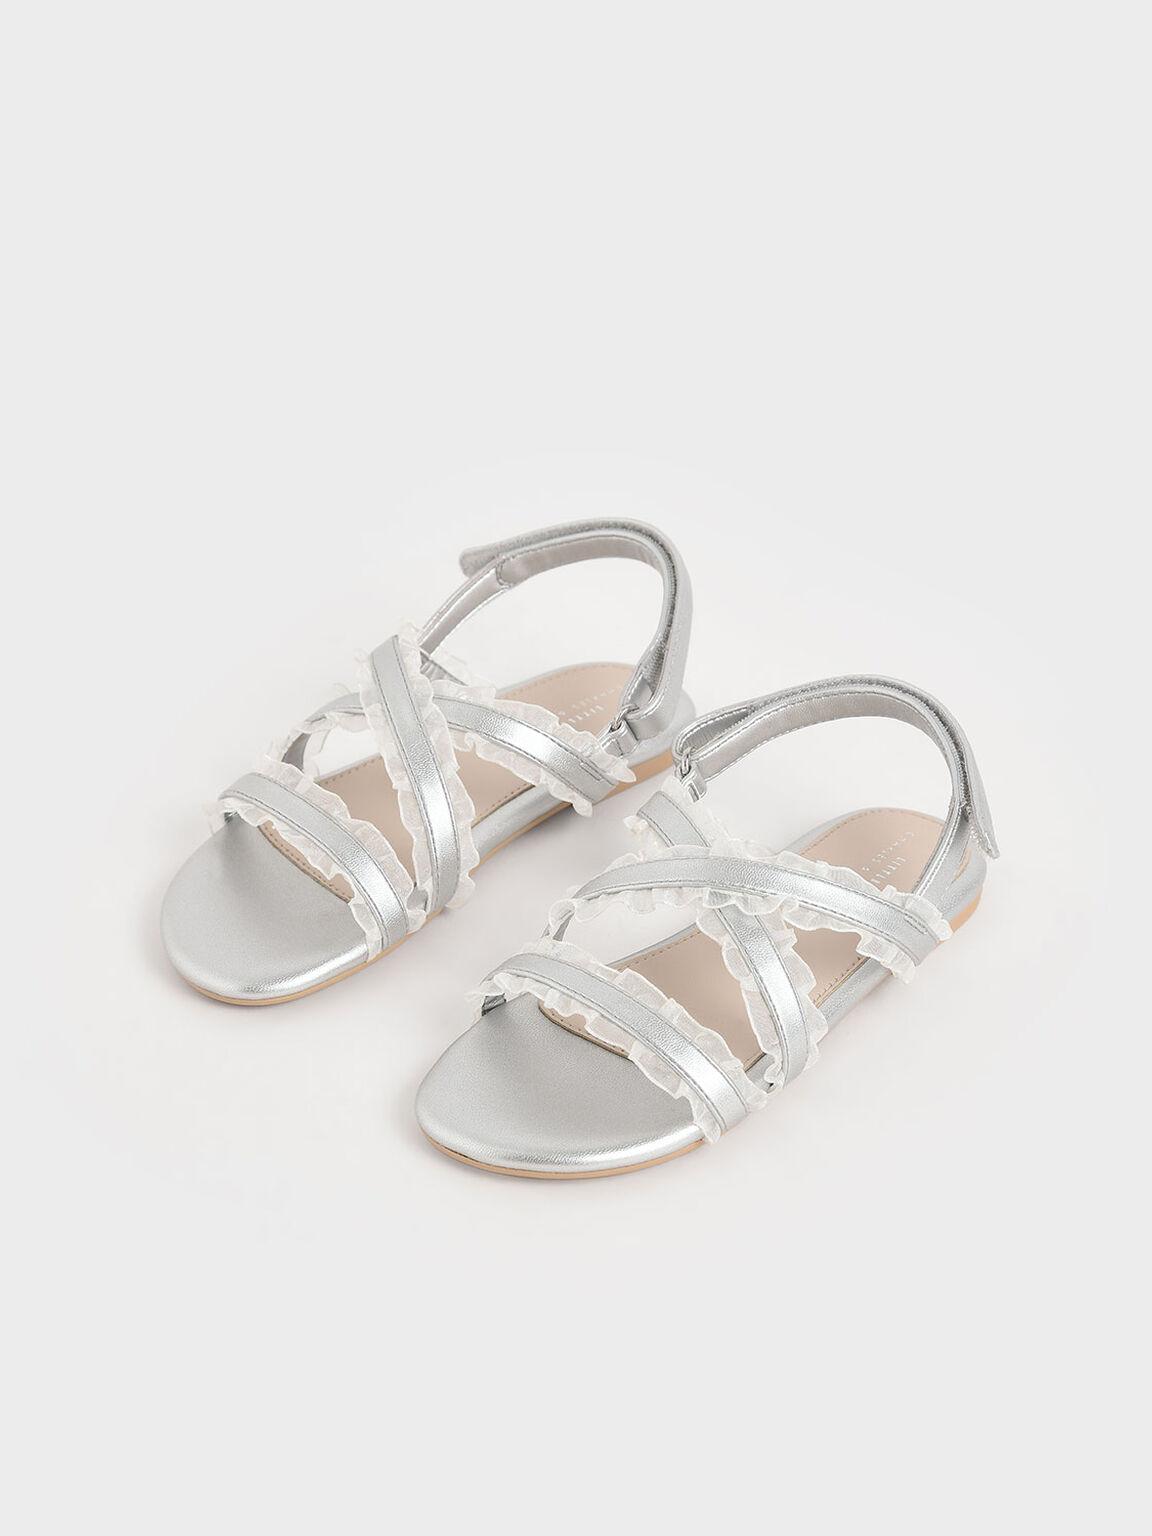 Girls' Metallic Frill-Trim Flat Sandals, Silver, hi-res